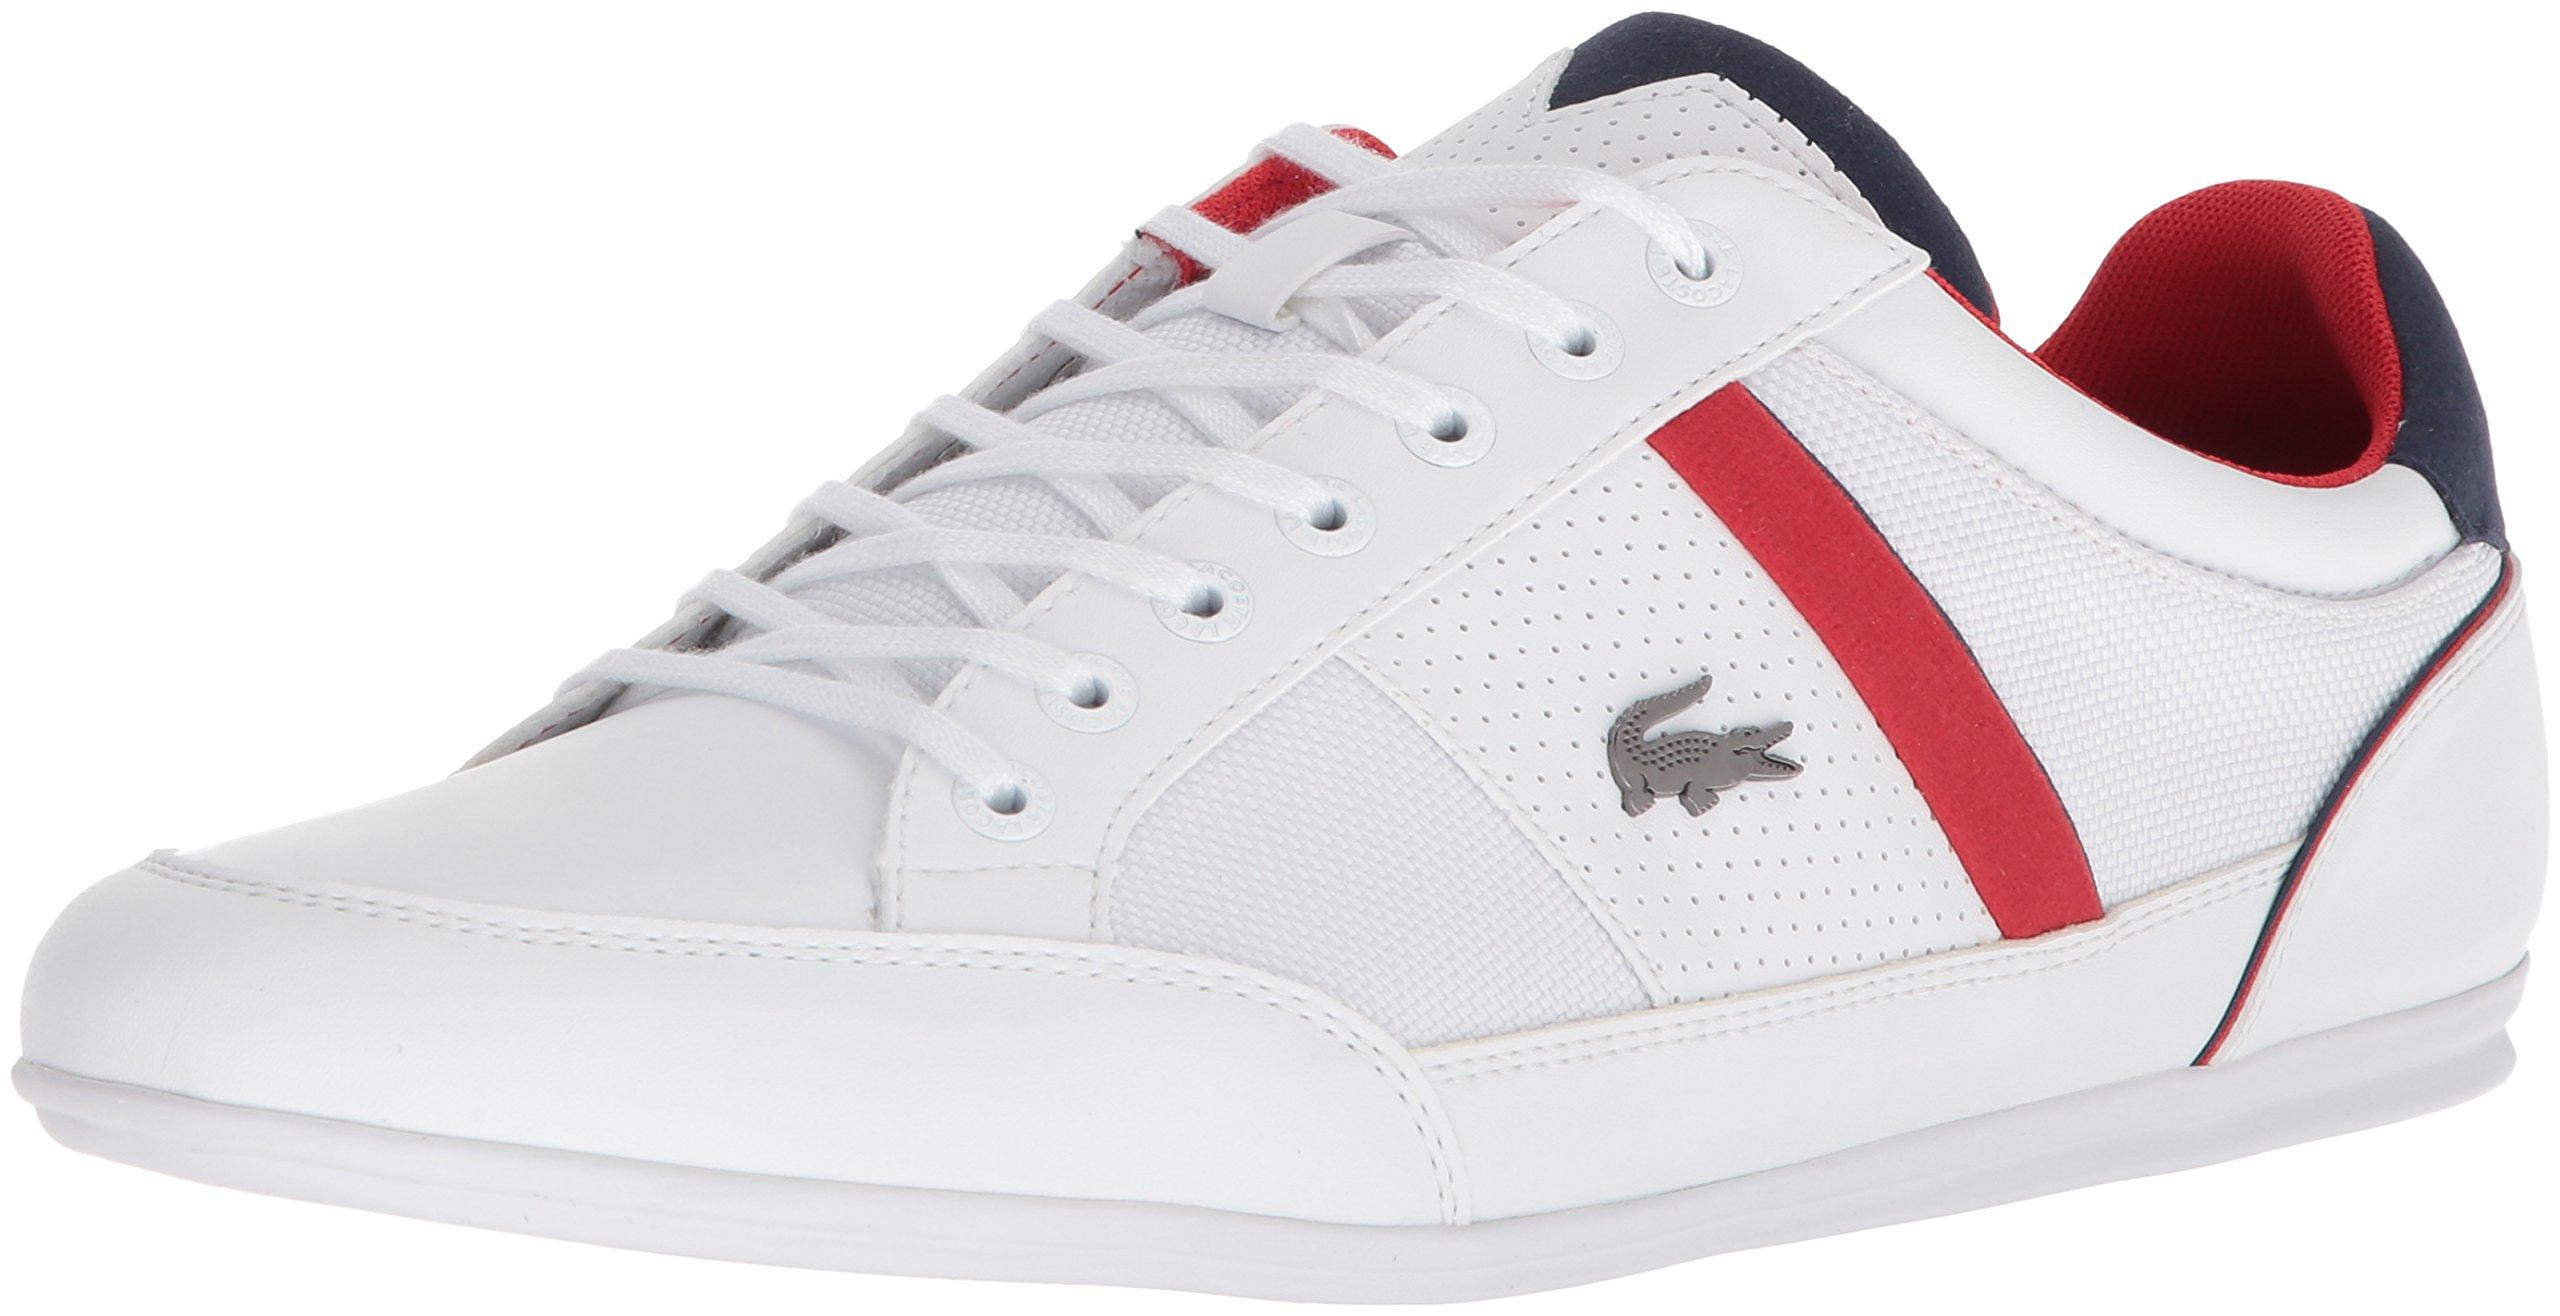 Lacoste Men's Chaymon Sneaker, White, 9 M US